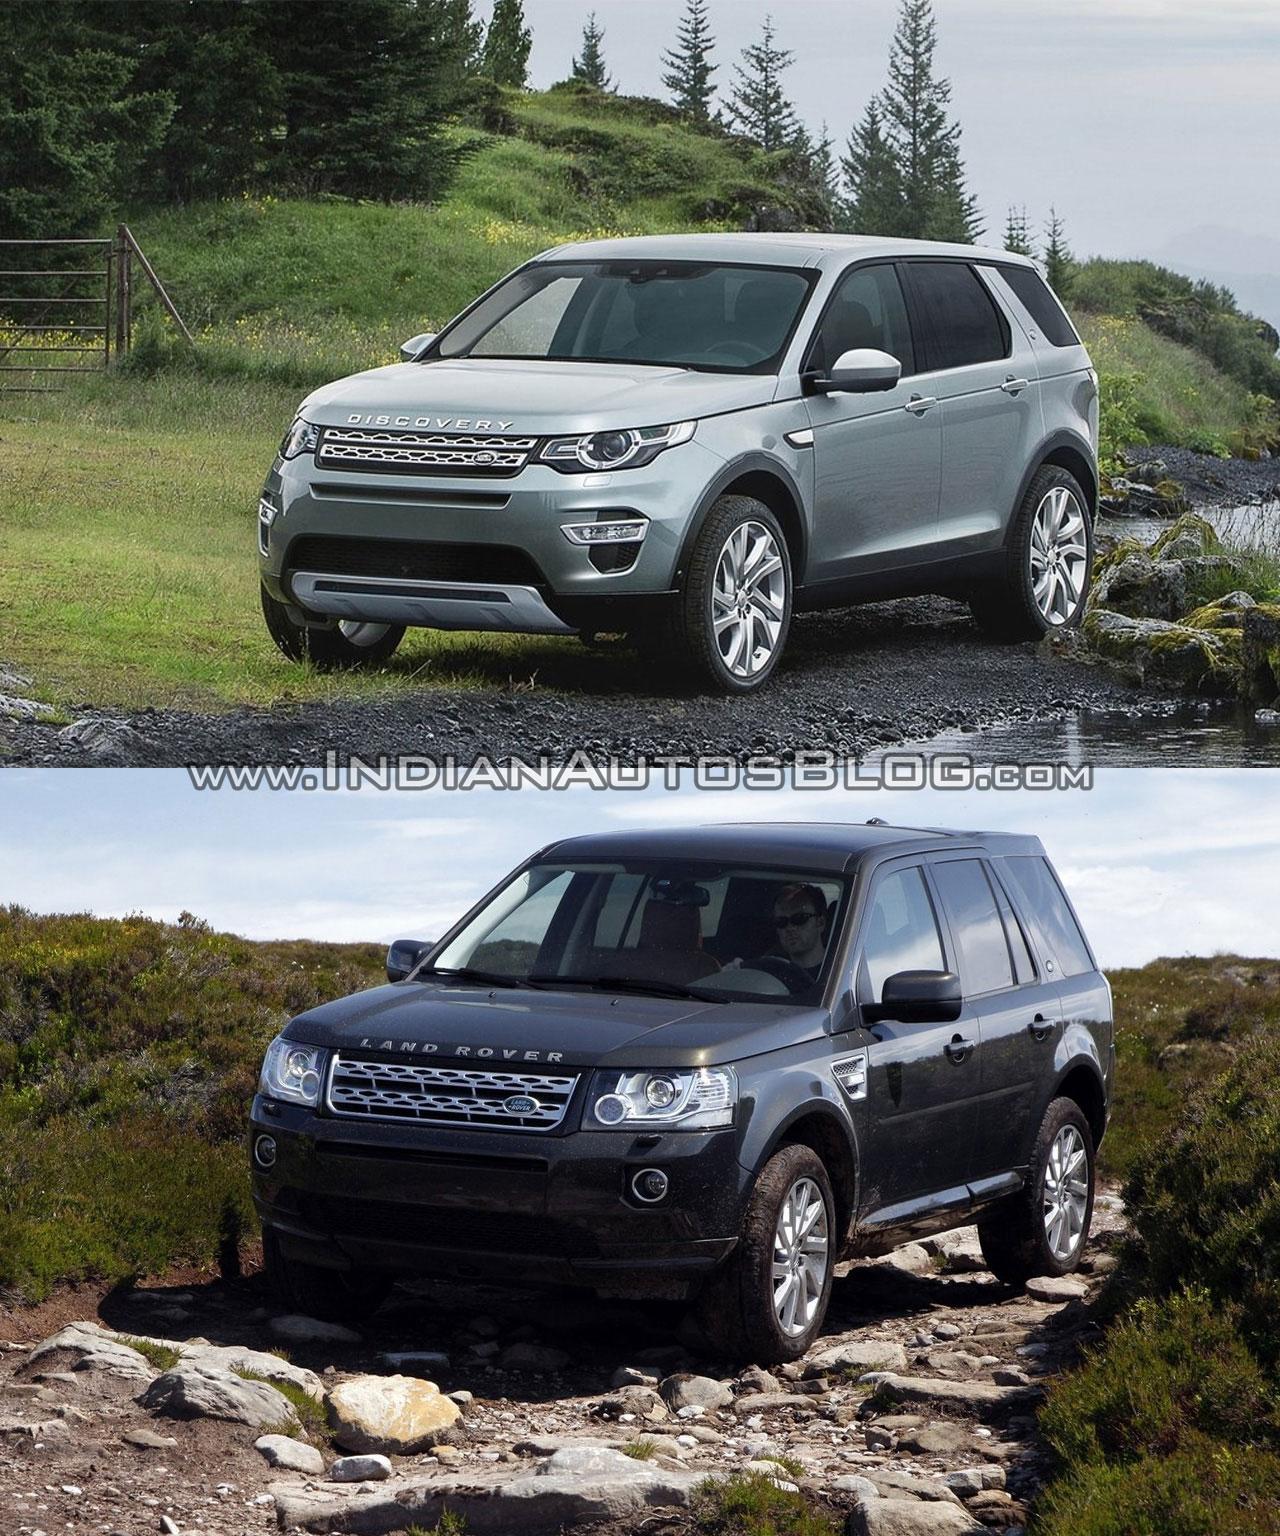 Land Rover Discovery Sport vs Freelander